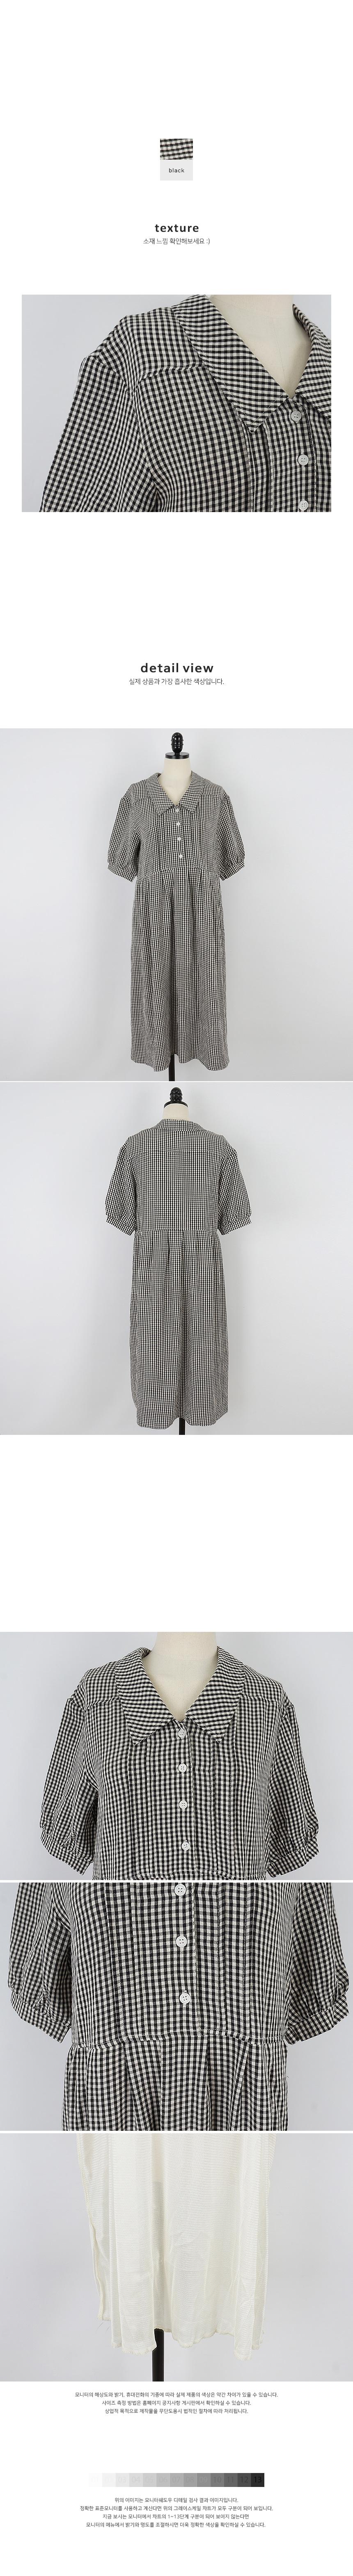 Yoto check collar Dress